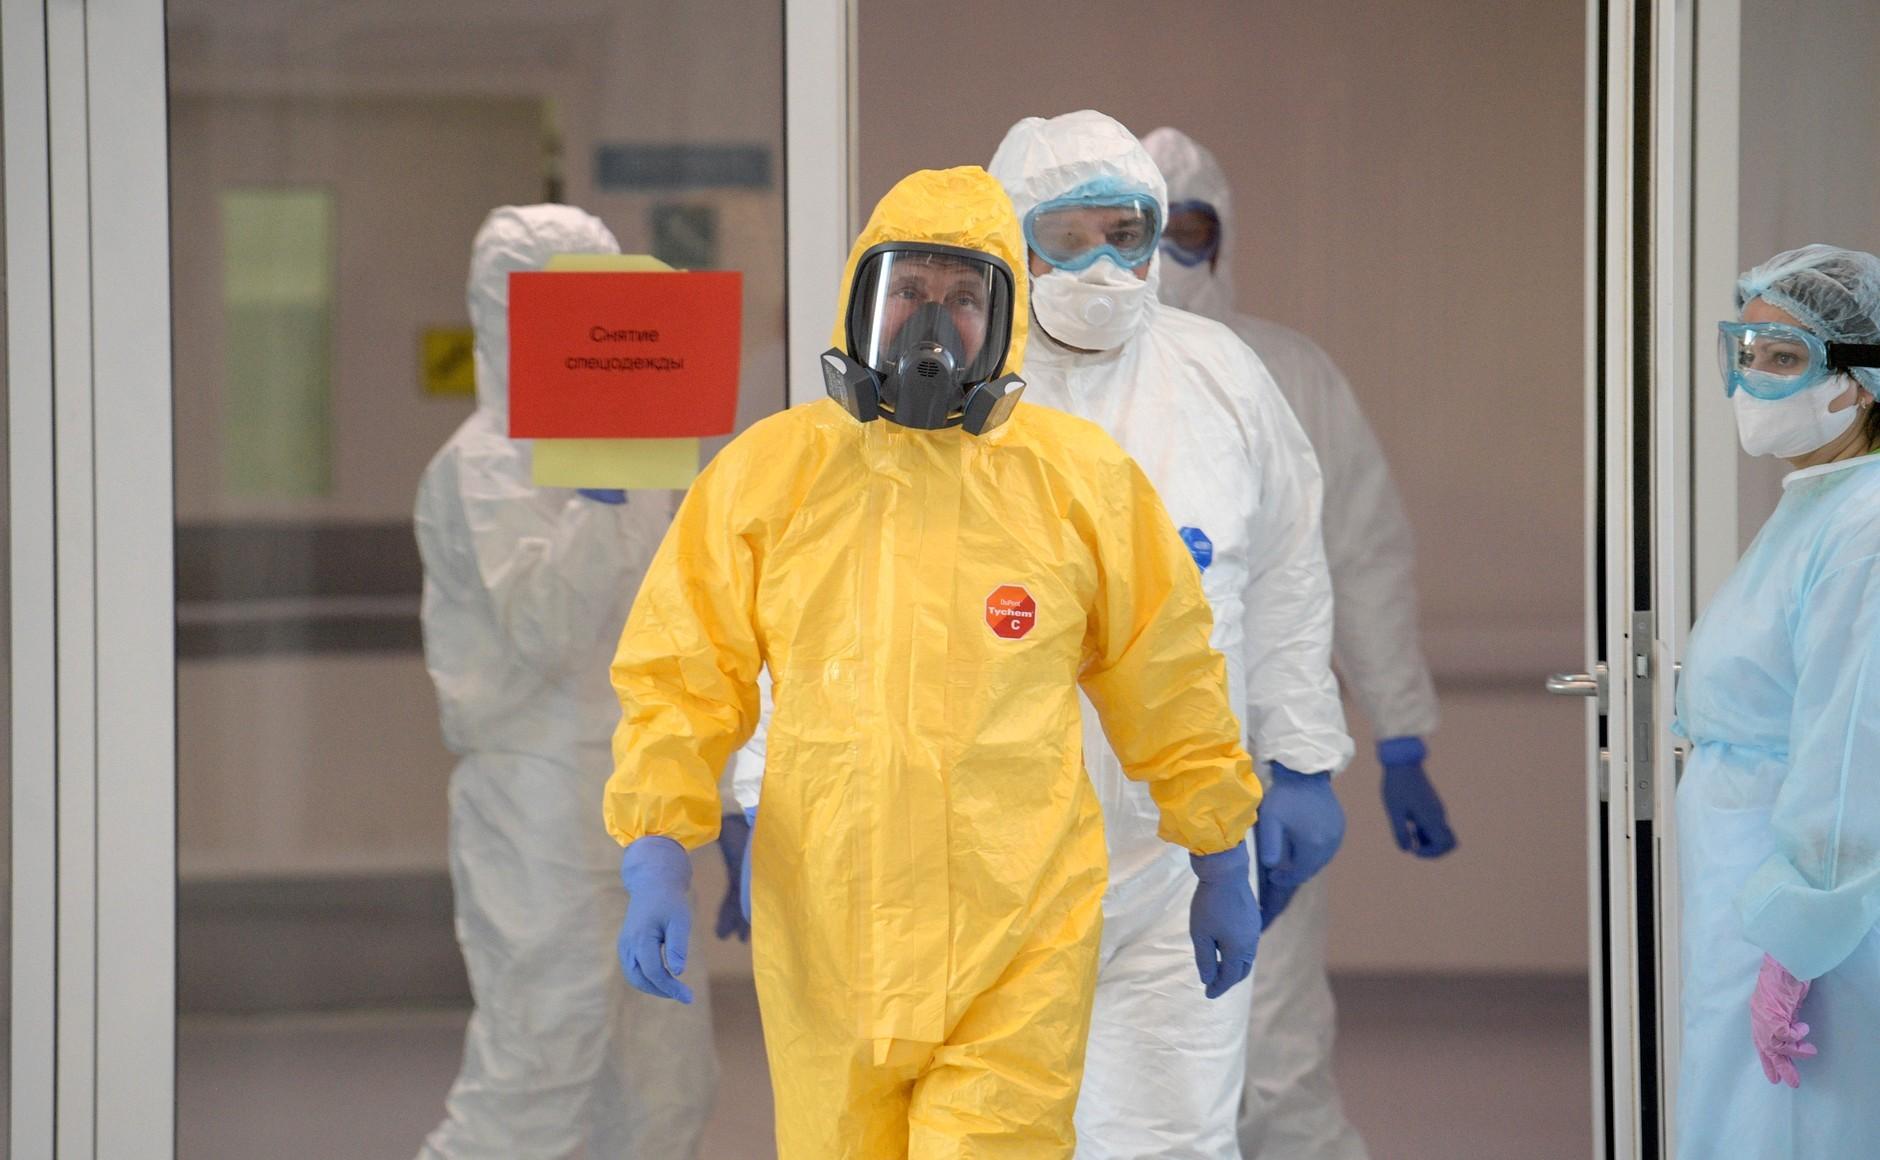 Russia's Coronavirus Cases Prompt Putin to Change Strategy